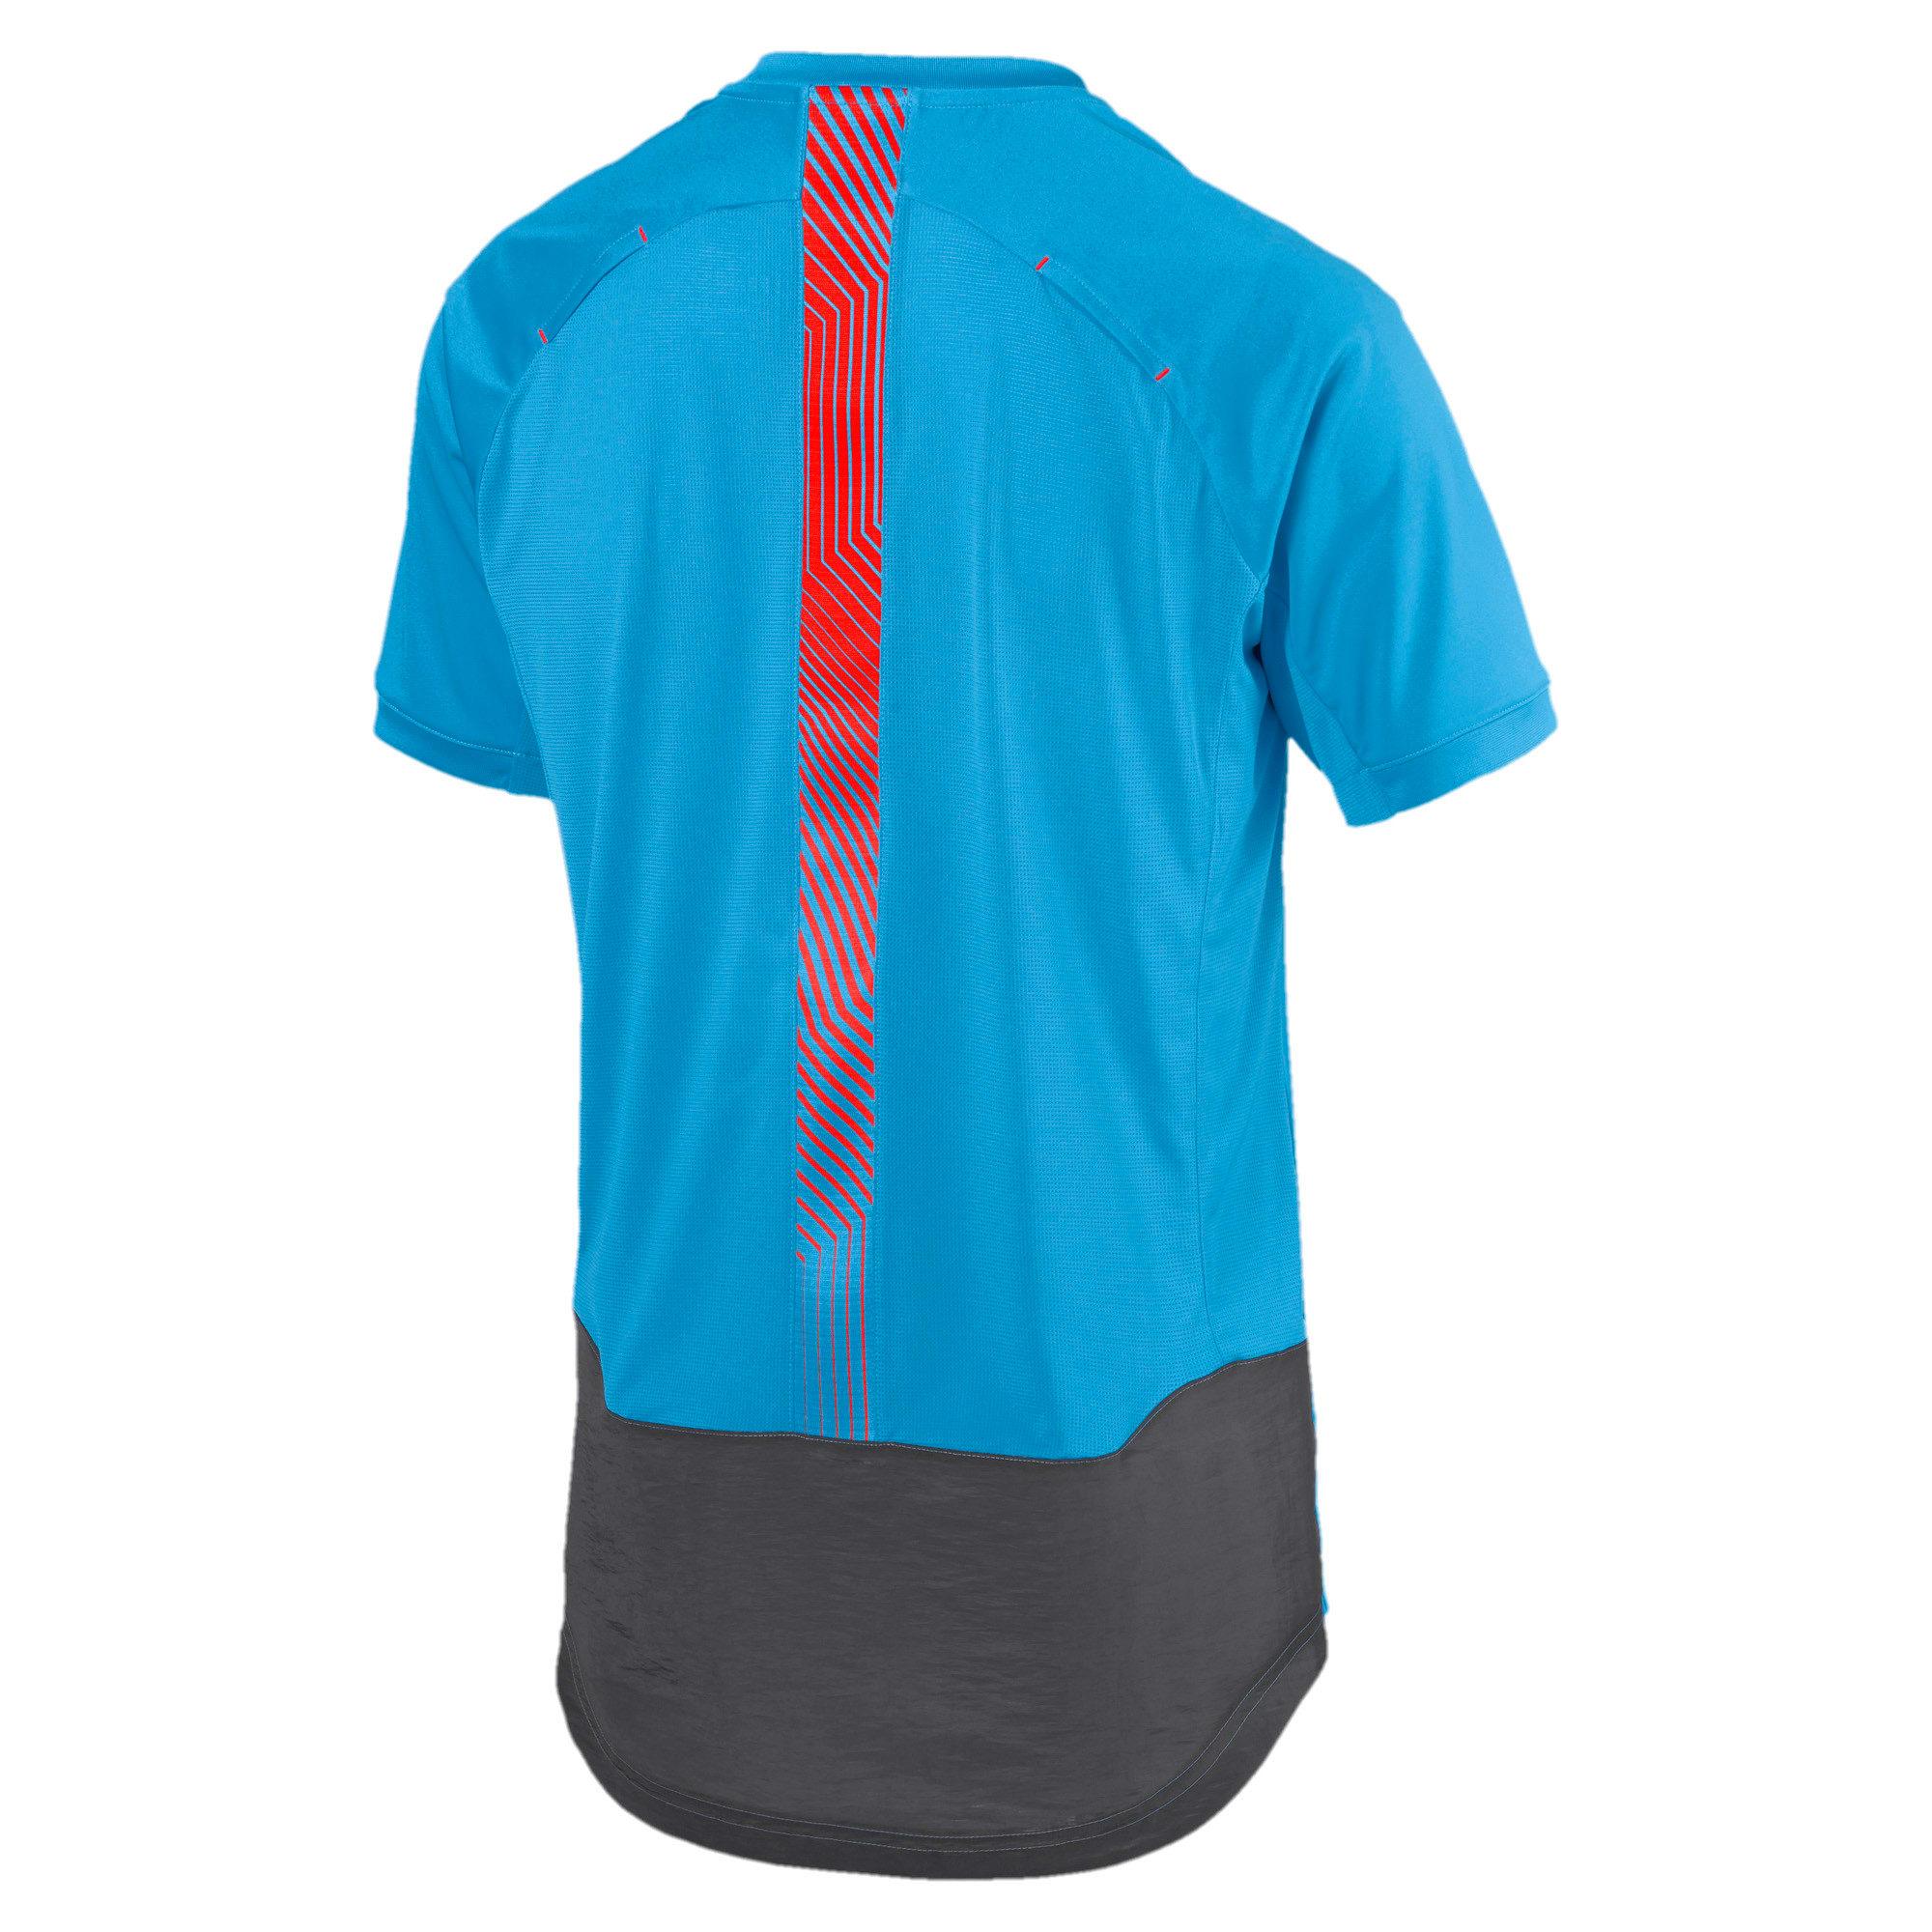 Thumbnail 5 of ftblNXT Pro Men's Training Top, Bleu Azur-Red Blast, medium